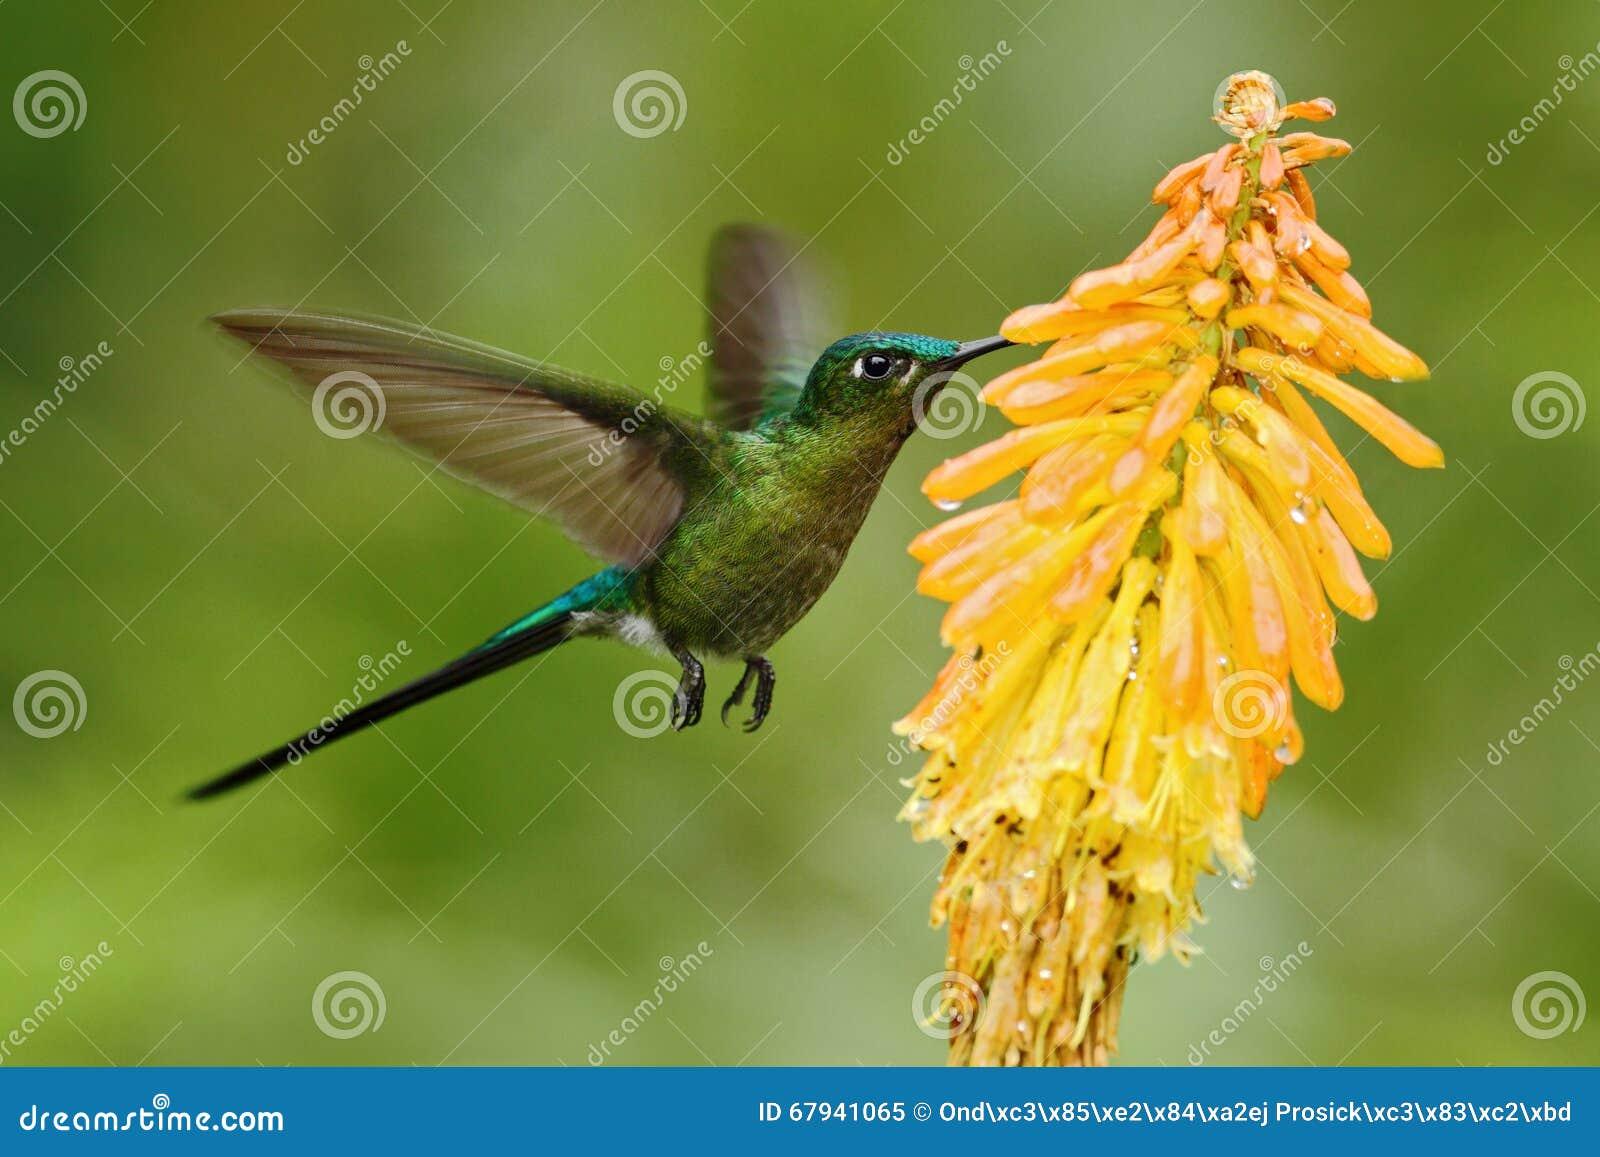 Hummingbird Long-tailed Sylph eating nectar from beautiful yellow flower in Ecuador